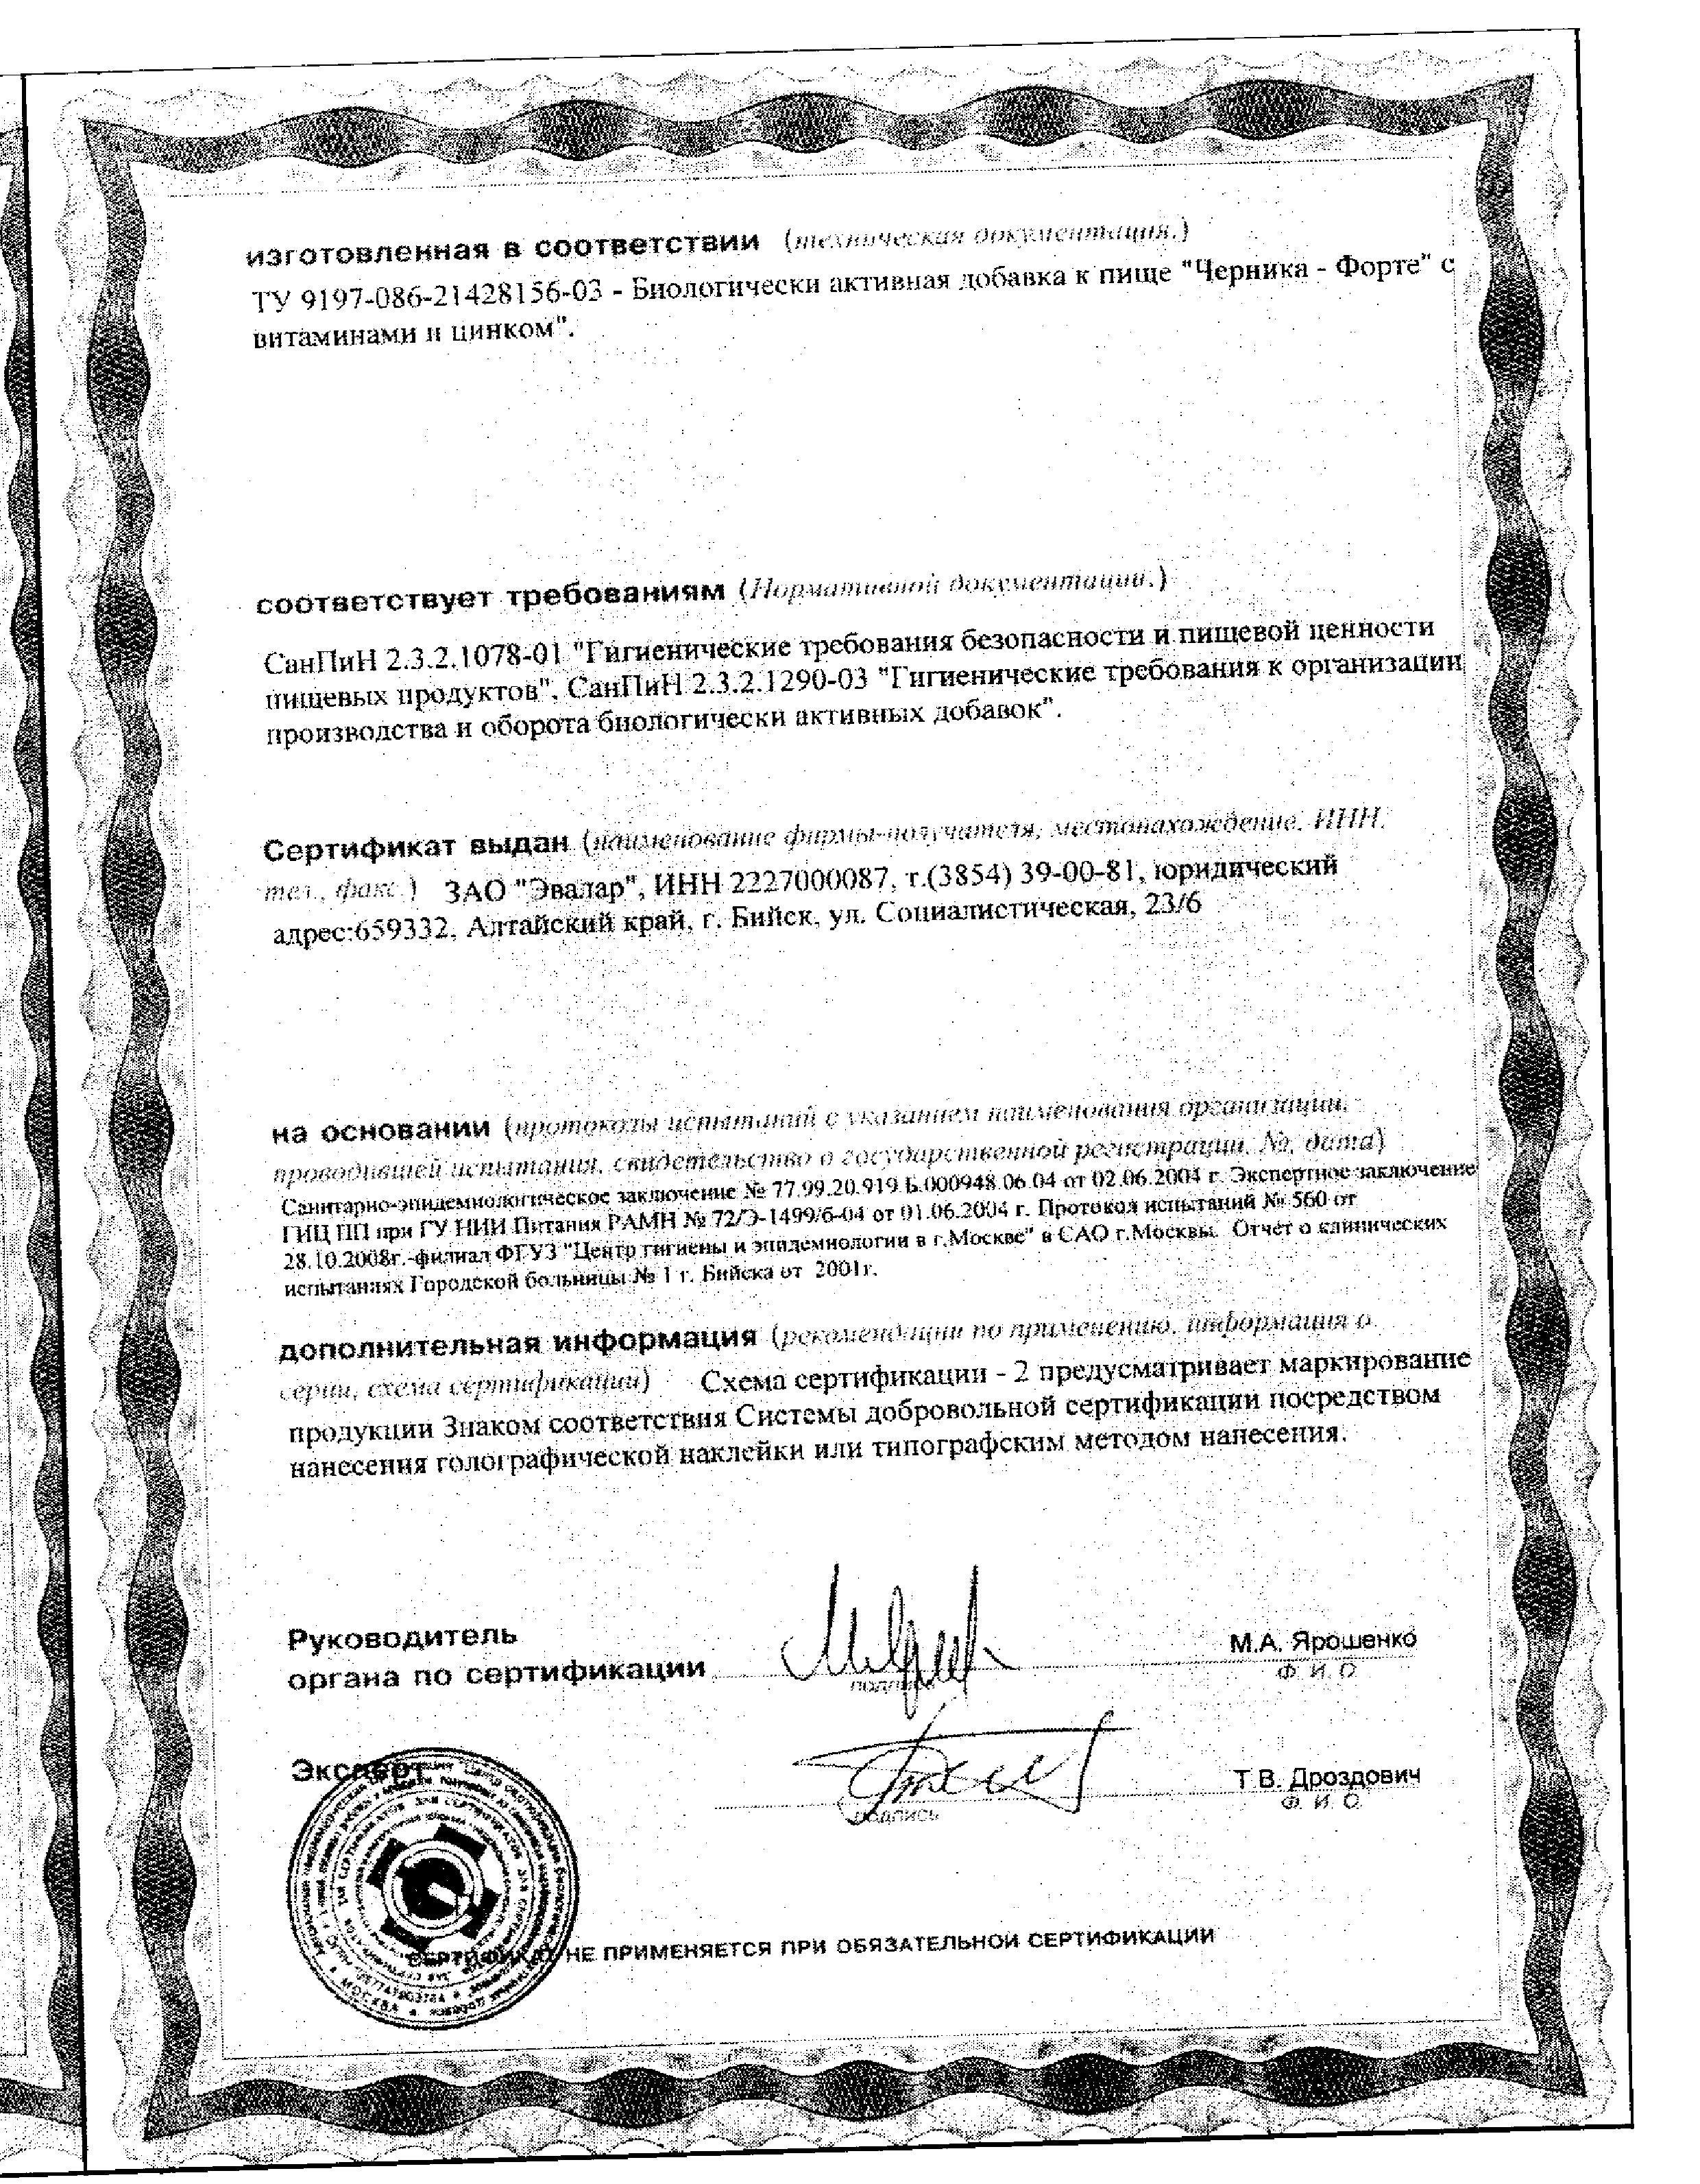 Черника-форте с витаминами и цинком сертификат